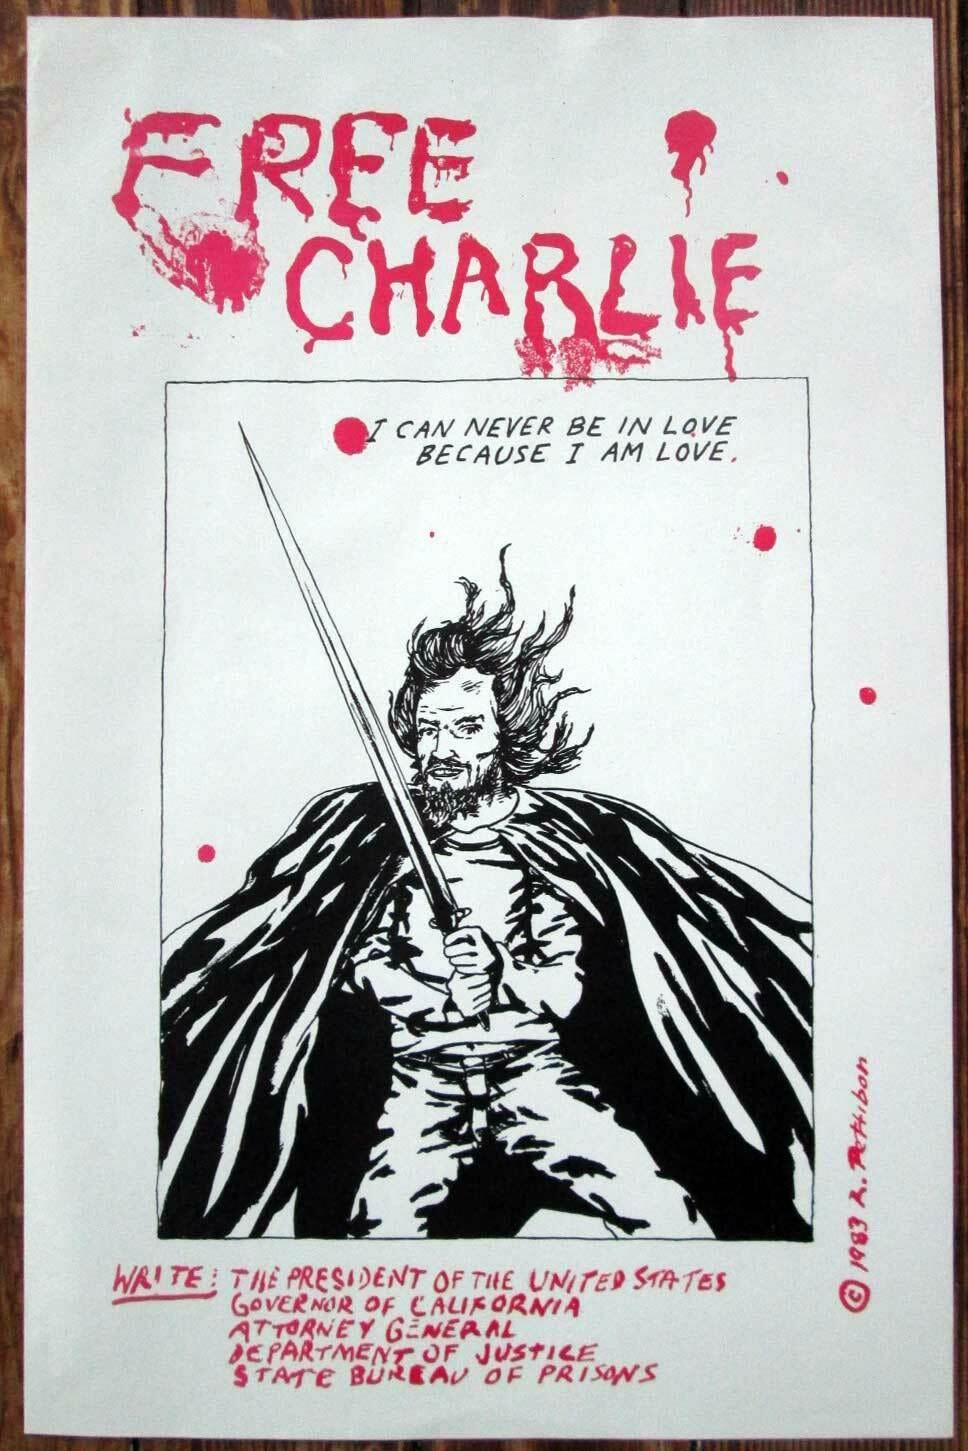 popsike.com - *Genuine* RAYMOND PETTIBON Free Charlie POSTER 1983 SST CHARLES  MANSON - auction details